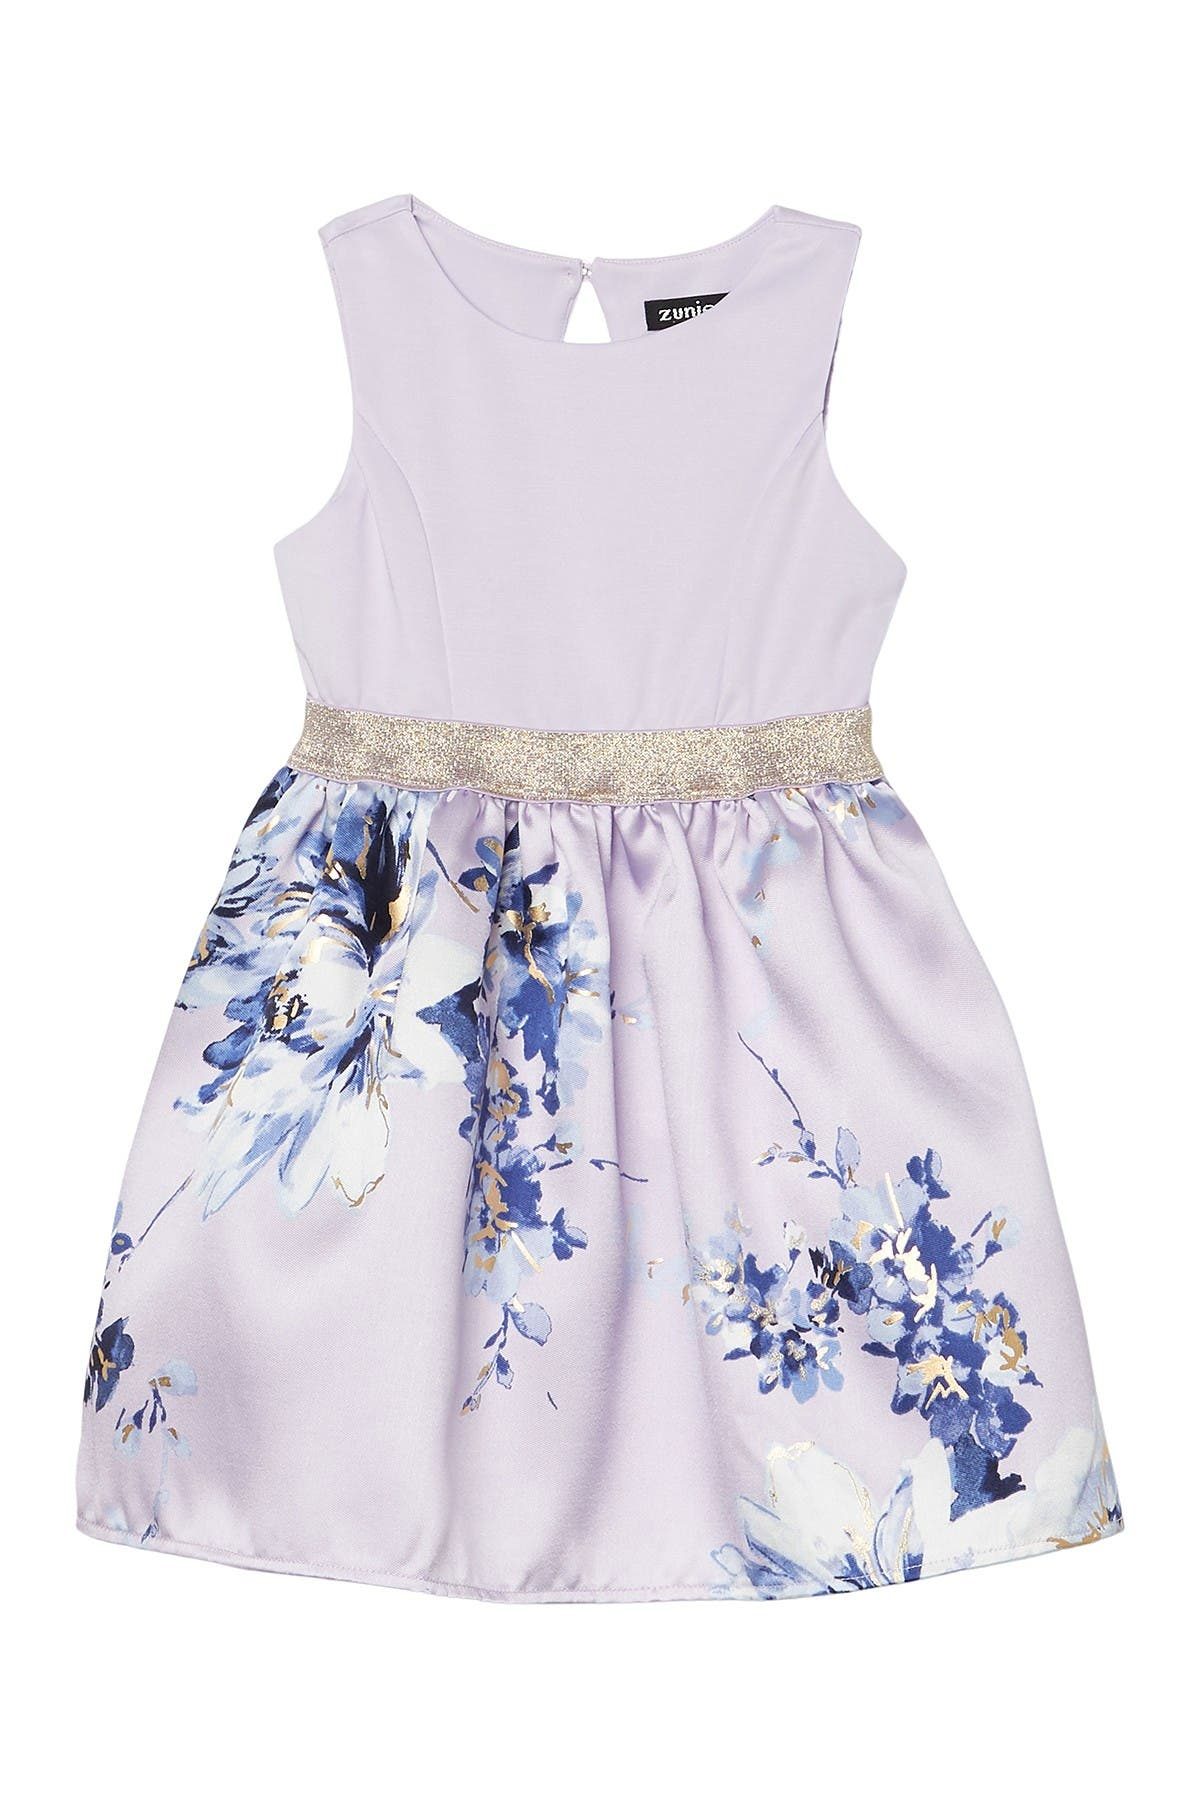 Image of Zunie Mikado Sleeveless Floral Dress